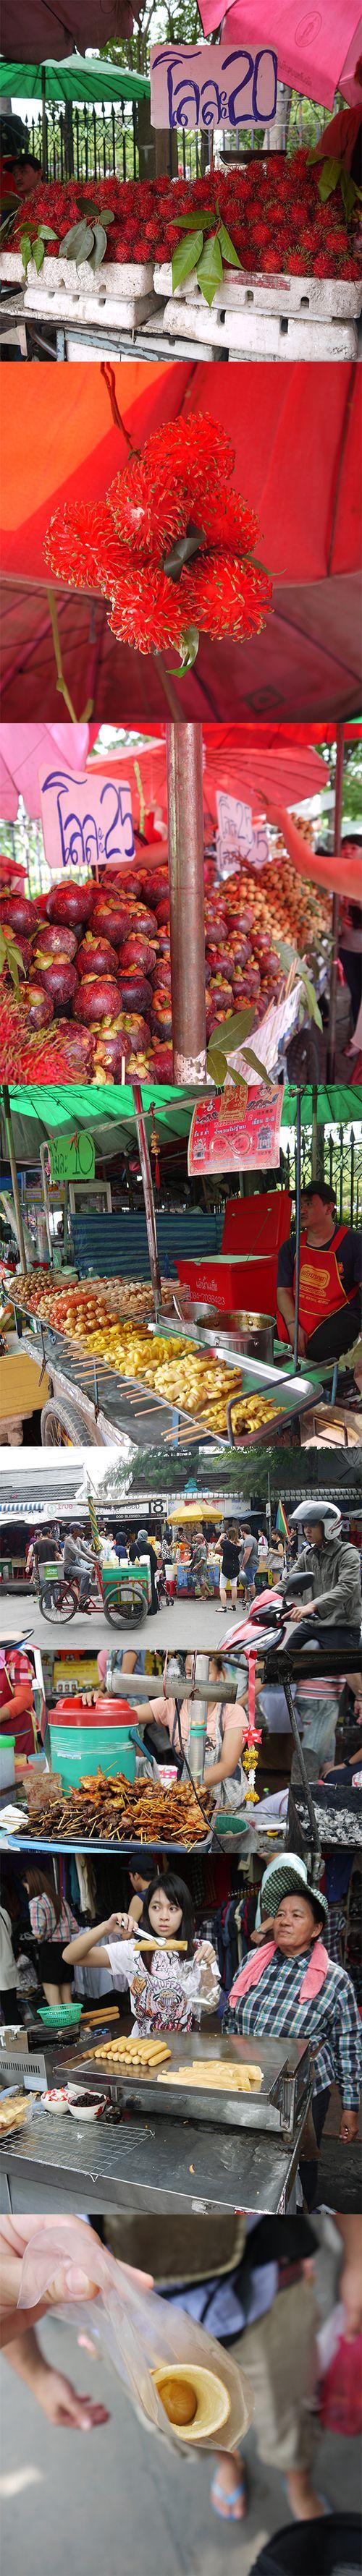 Bangkok-voyage-famille-pimpandpomme-thailande-9